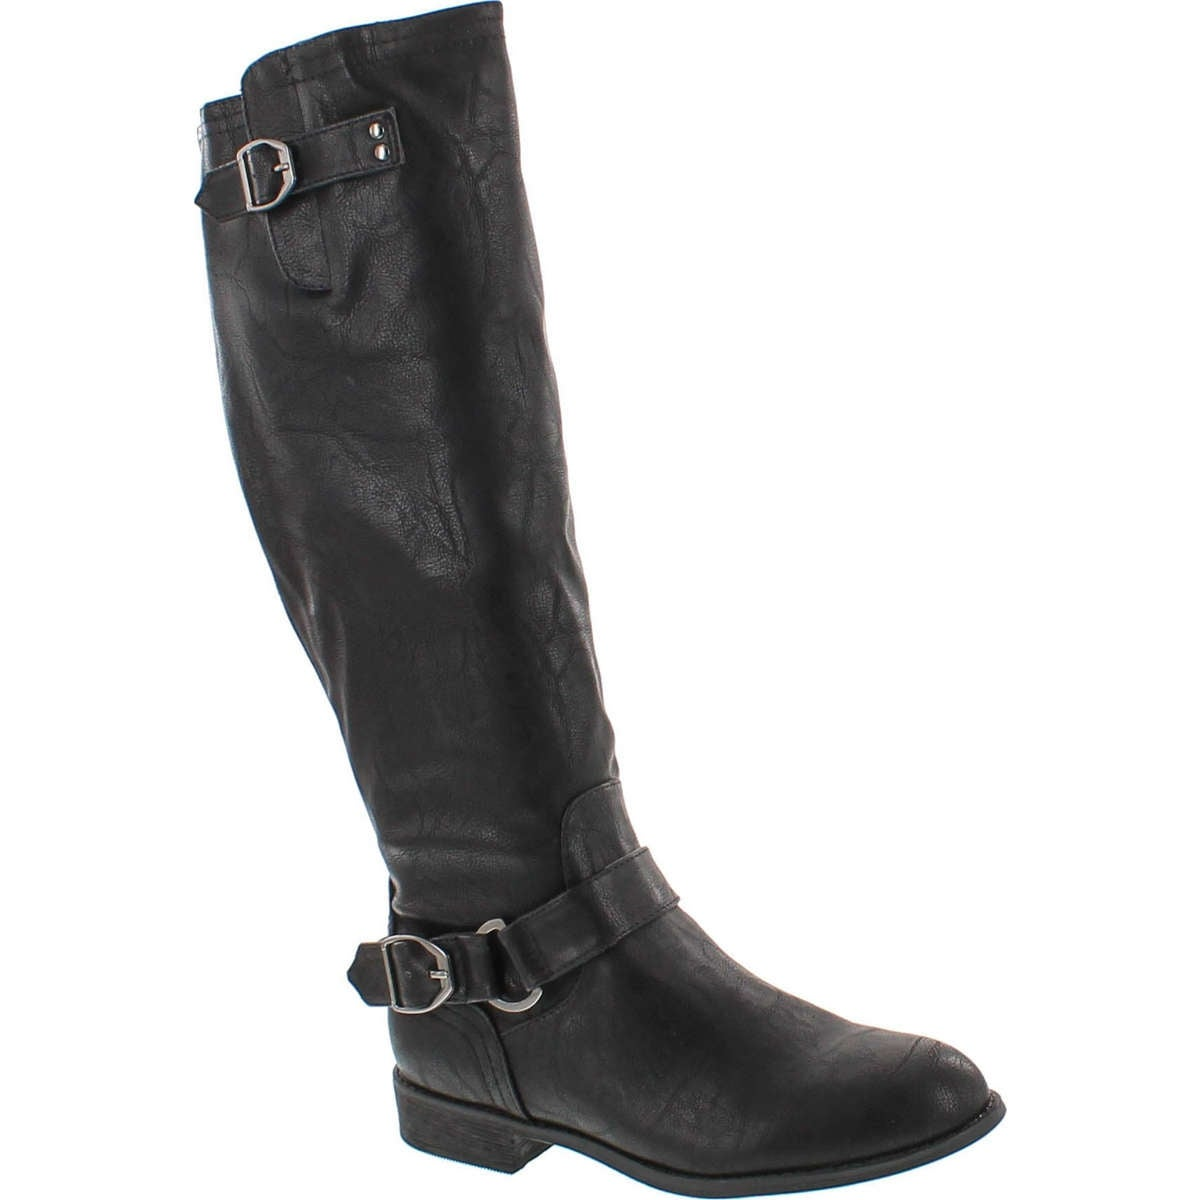 f5d5f90e6fd Buy Wild Diva Women s Boots Online at Overstock